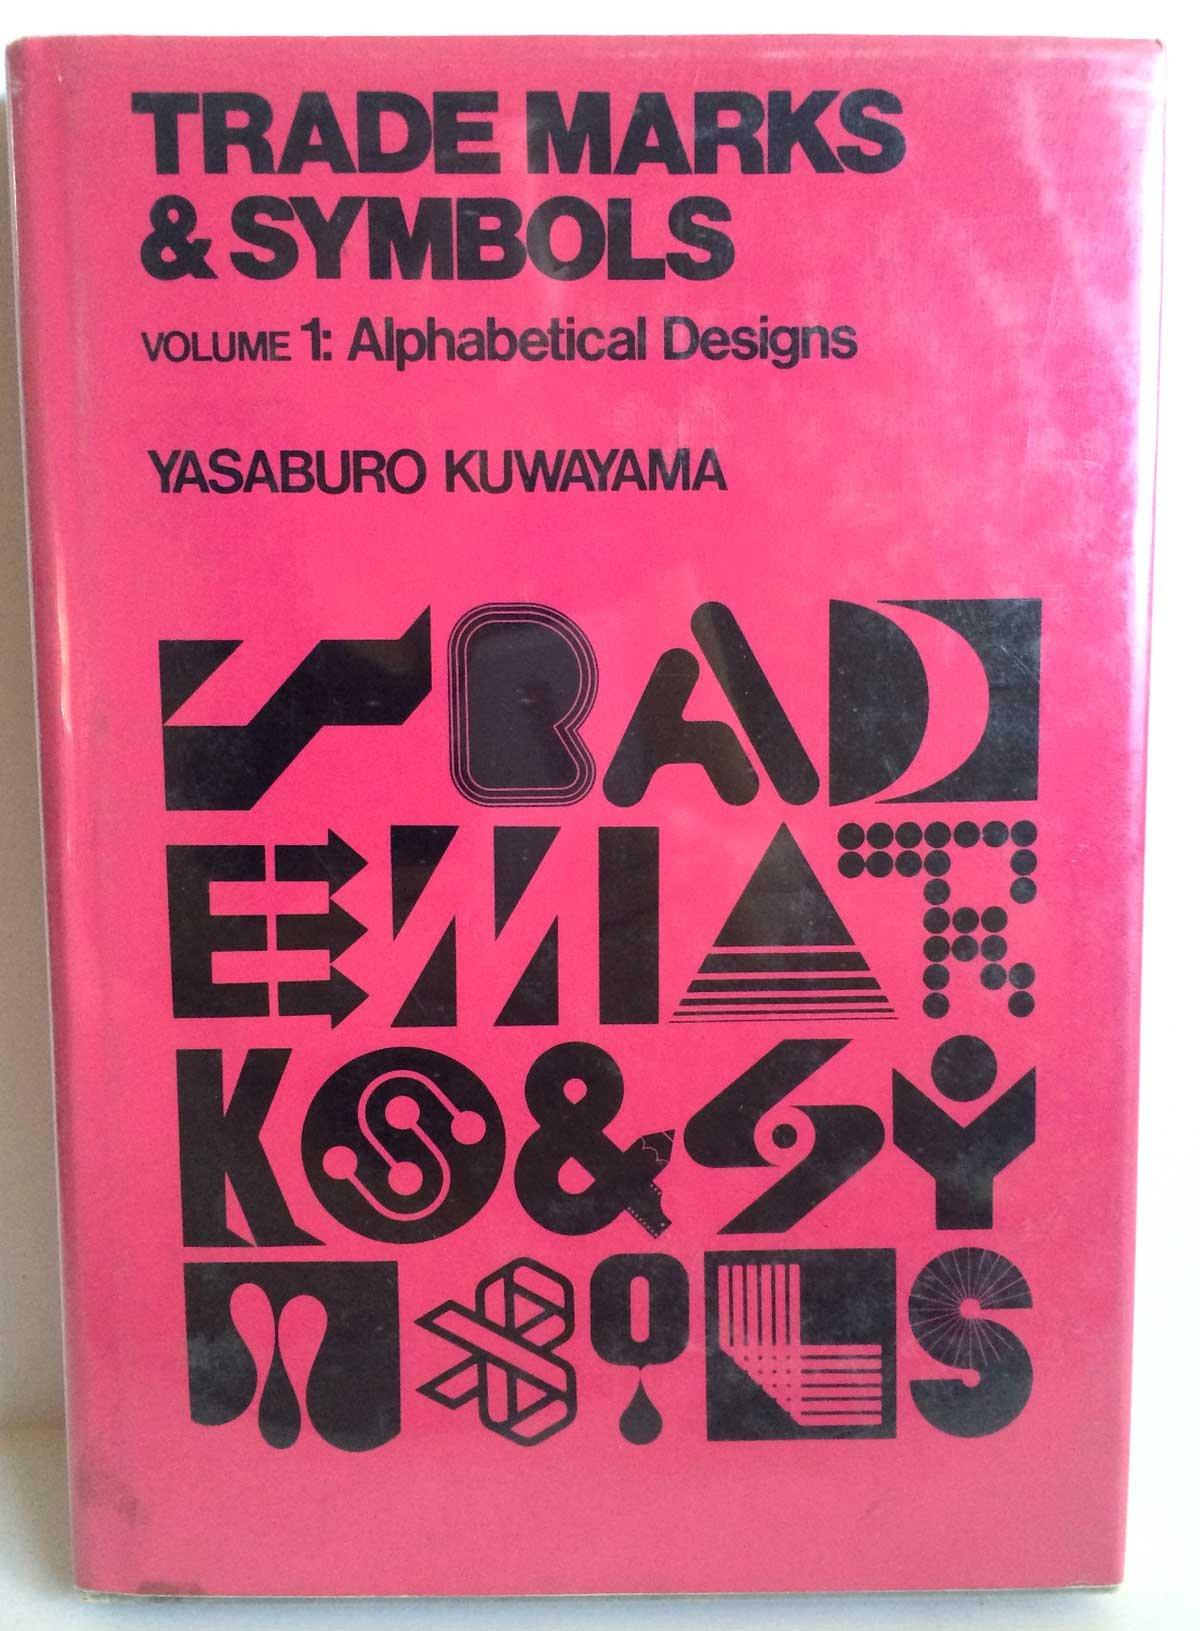 trademarks symbols volume 1 alphabetical designs amazon co uk trademarks symbols volume 1 alphabetical designs amazon co uk yasaburo kuwayama helios 9780442245634 books